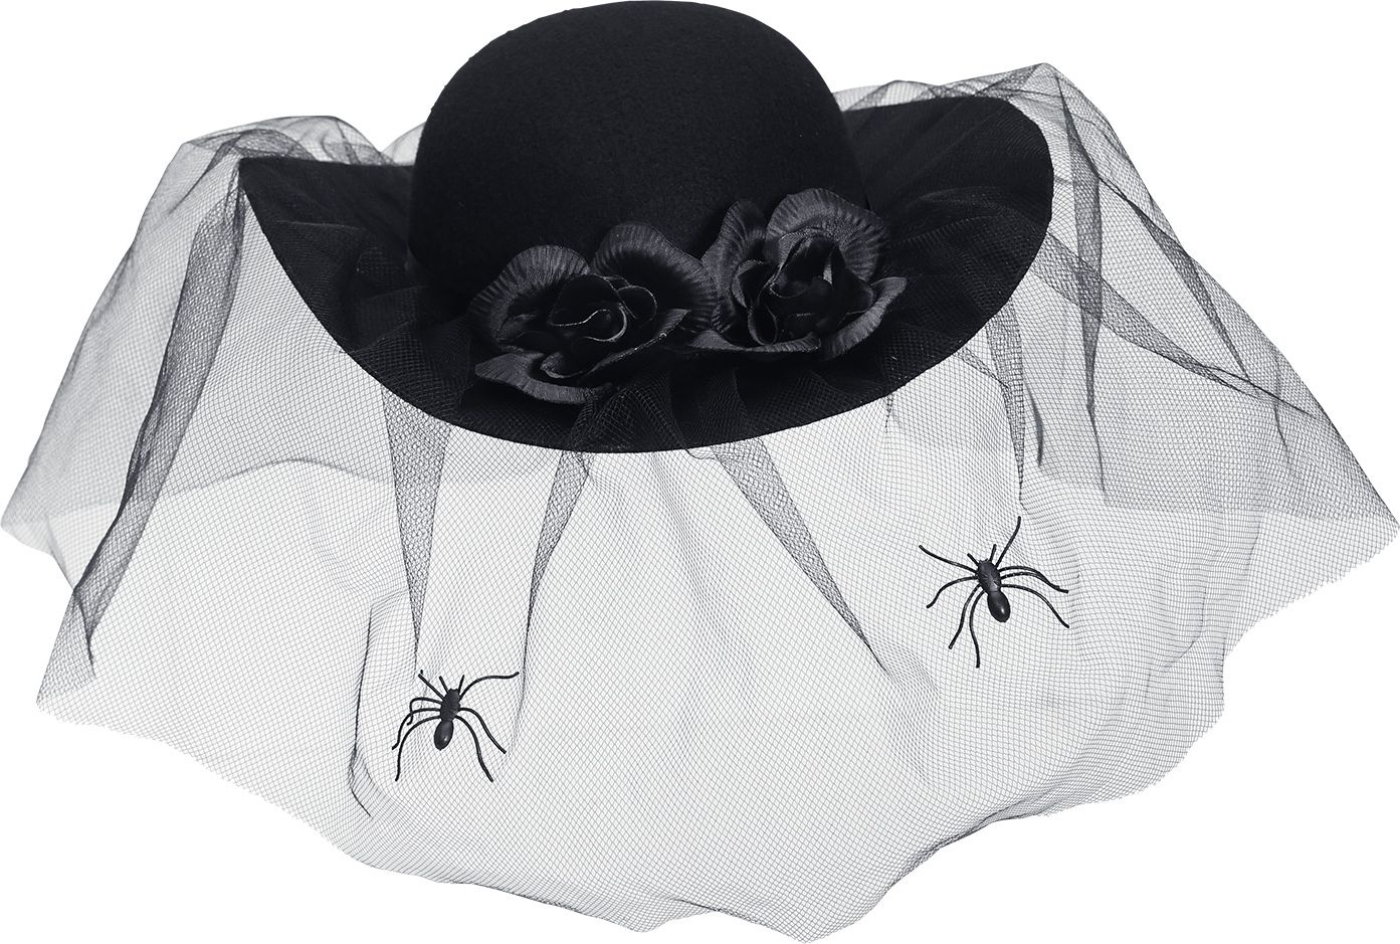 Zwarte weduwe hoed dames